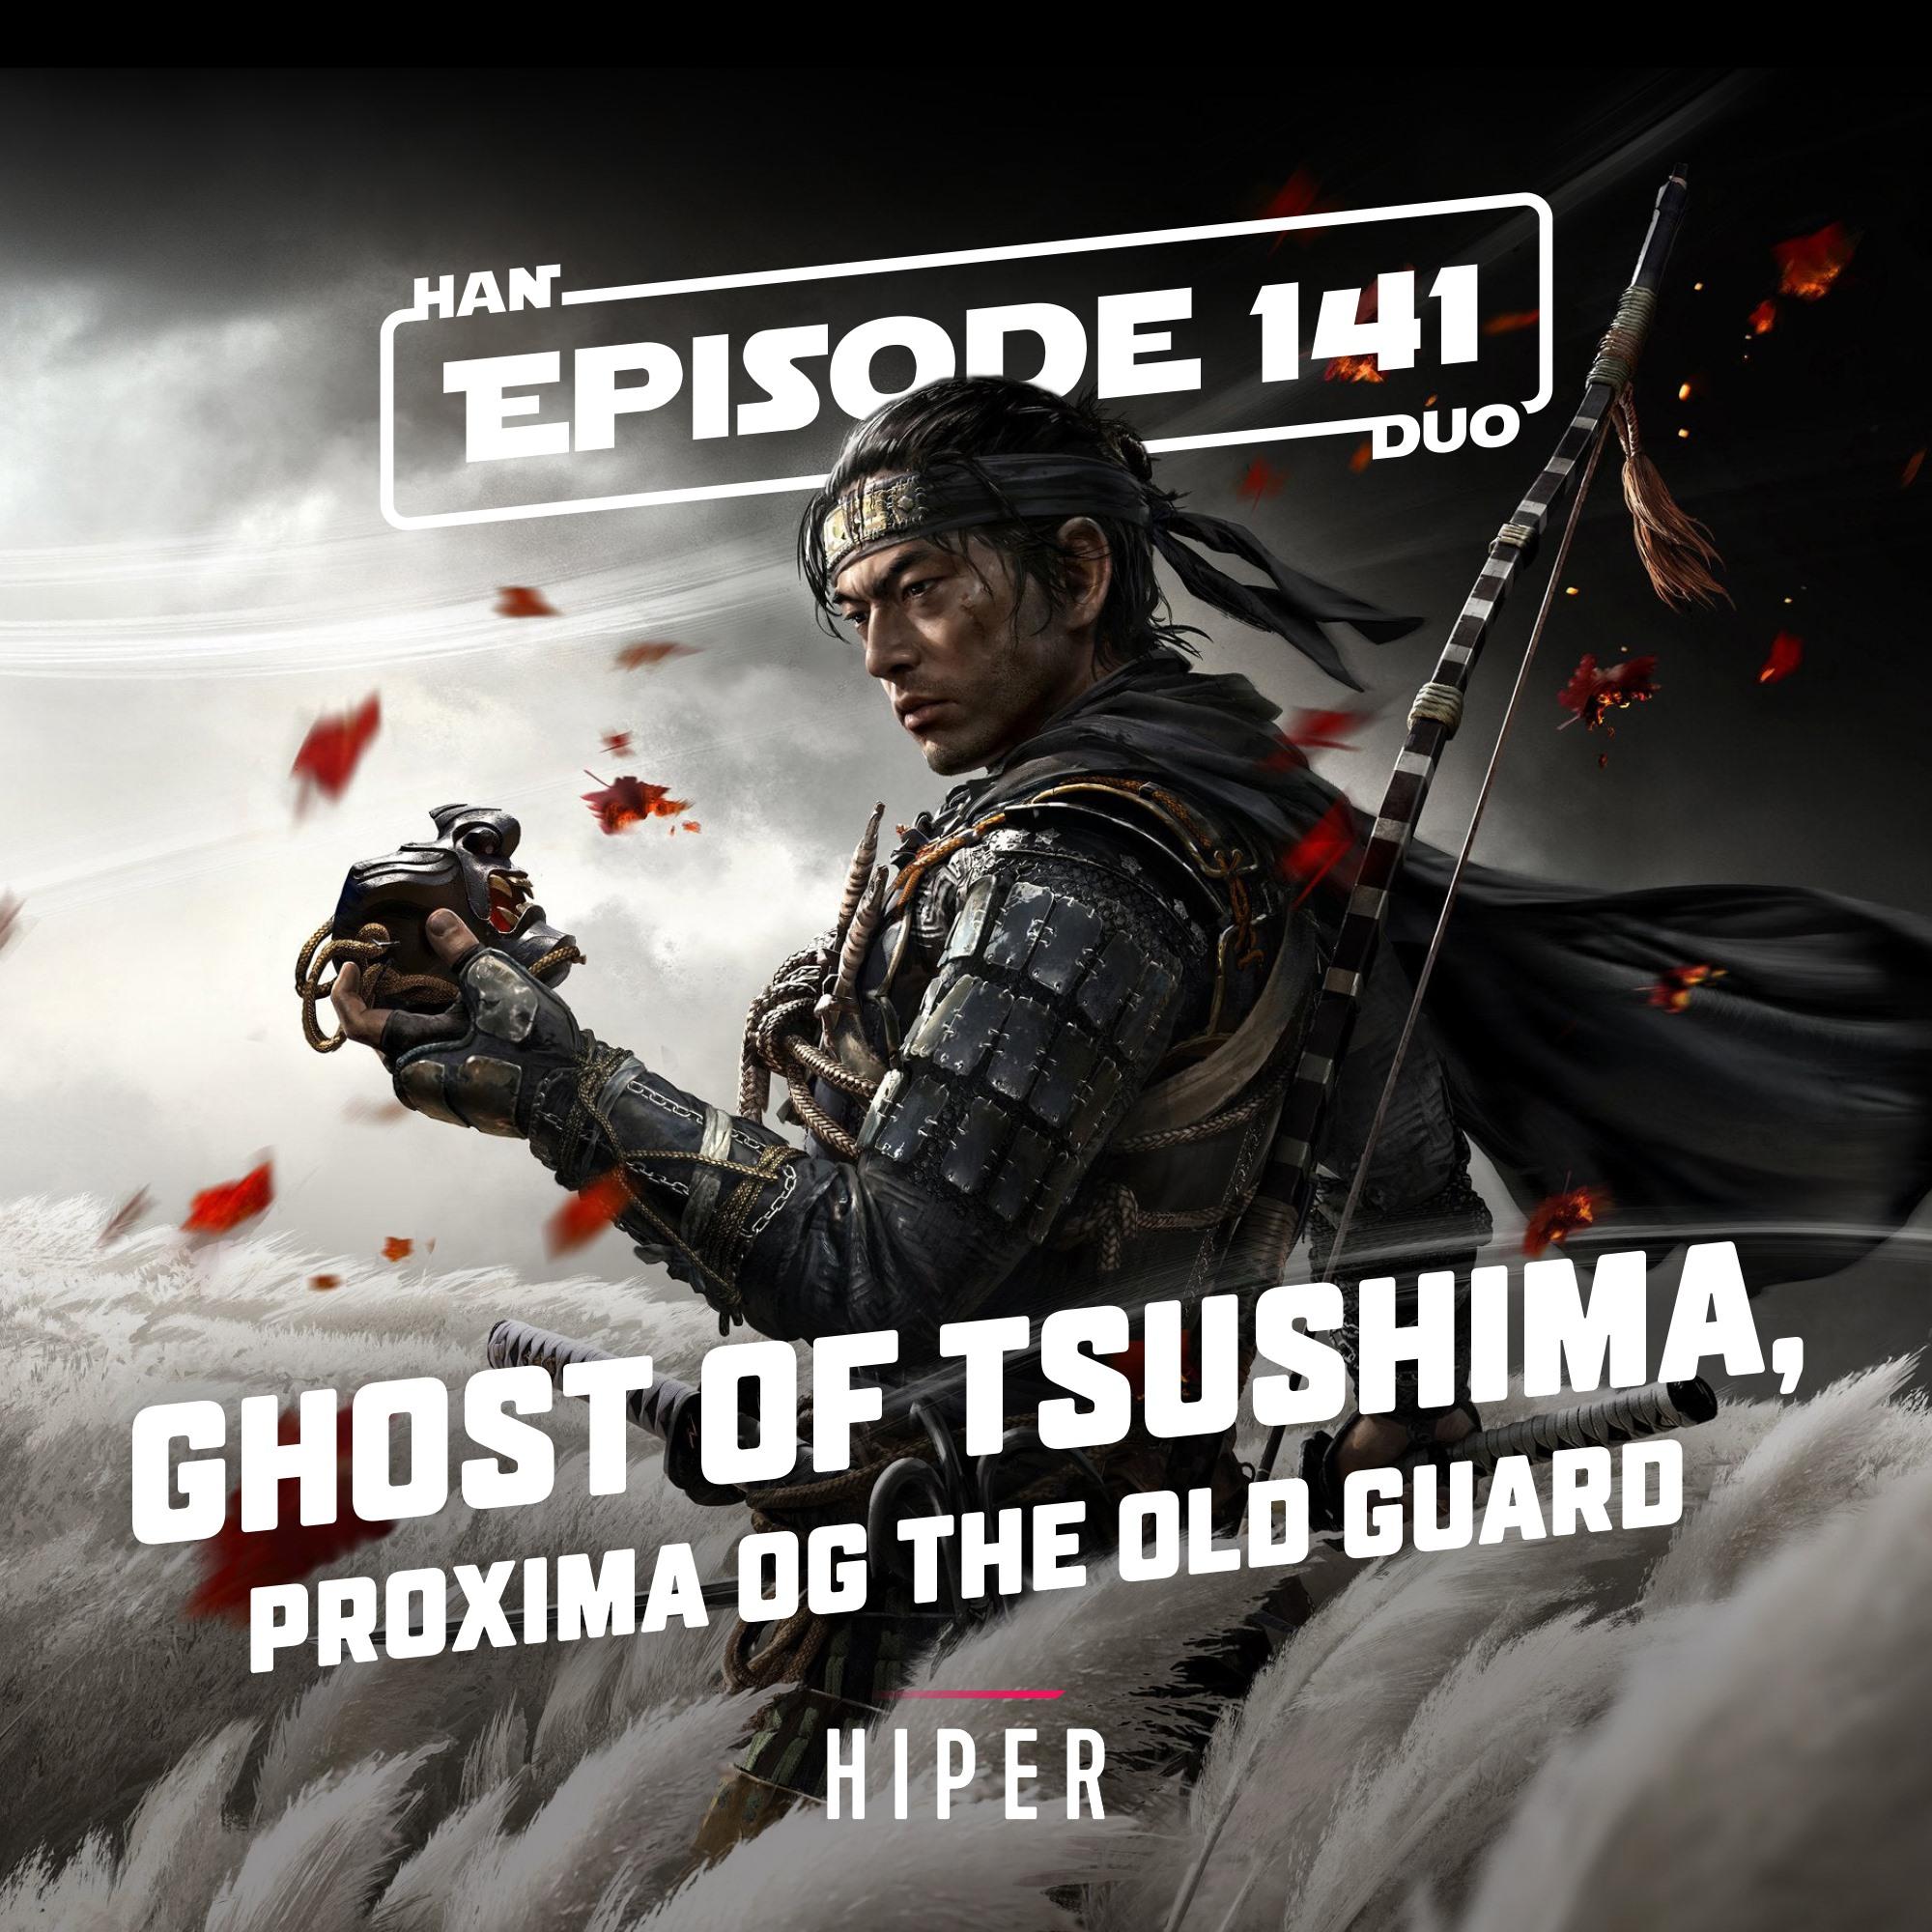 Han Duo #141: Ghost of Tsushima, The Old Guard, Proxima